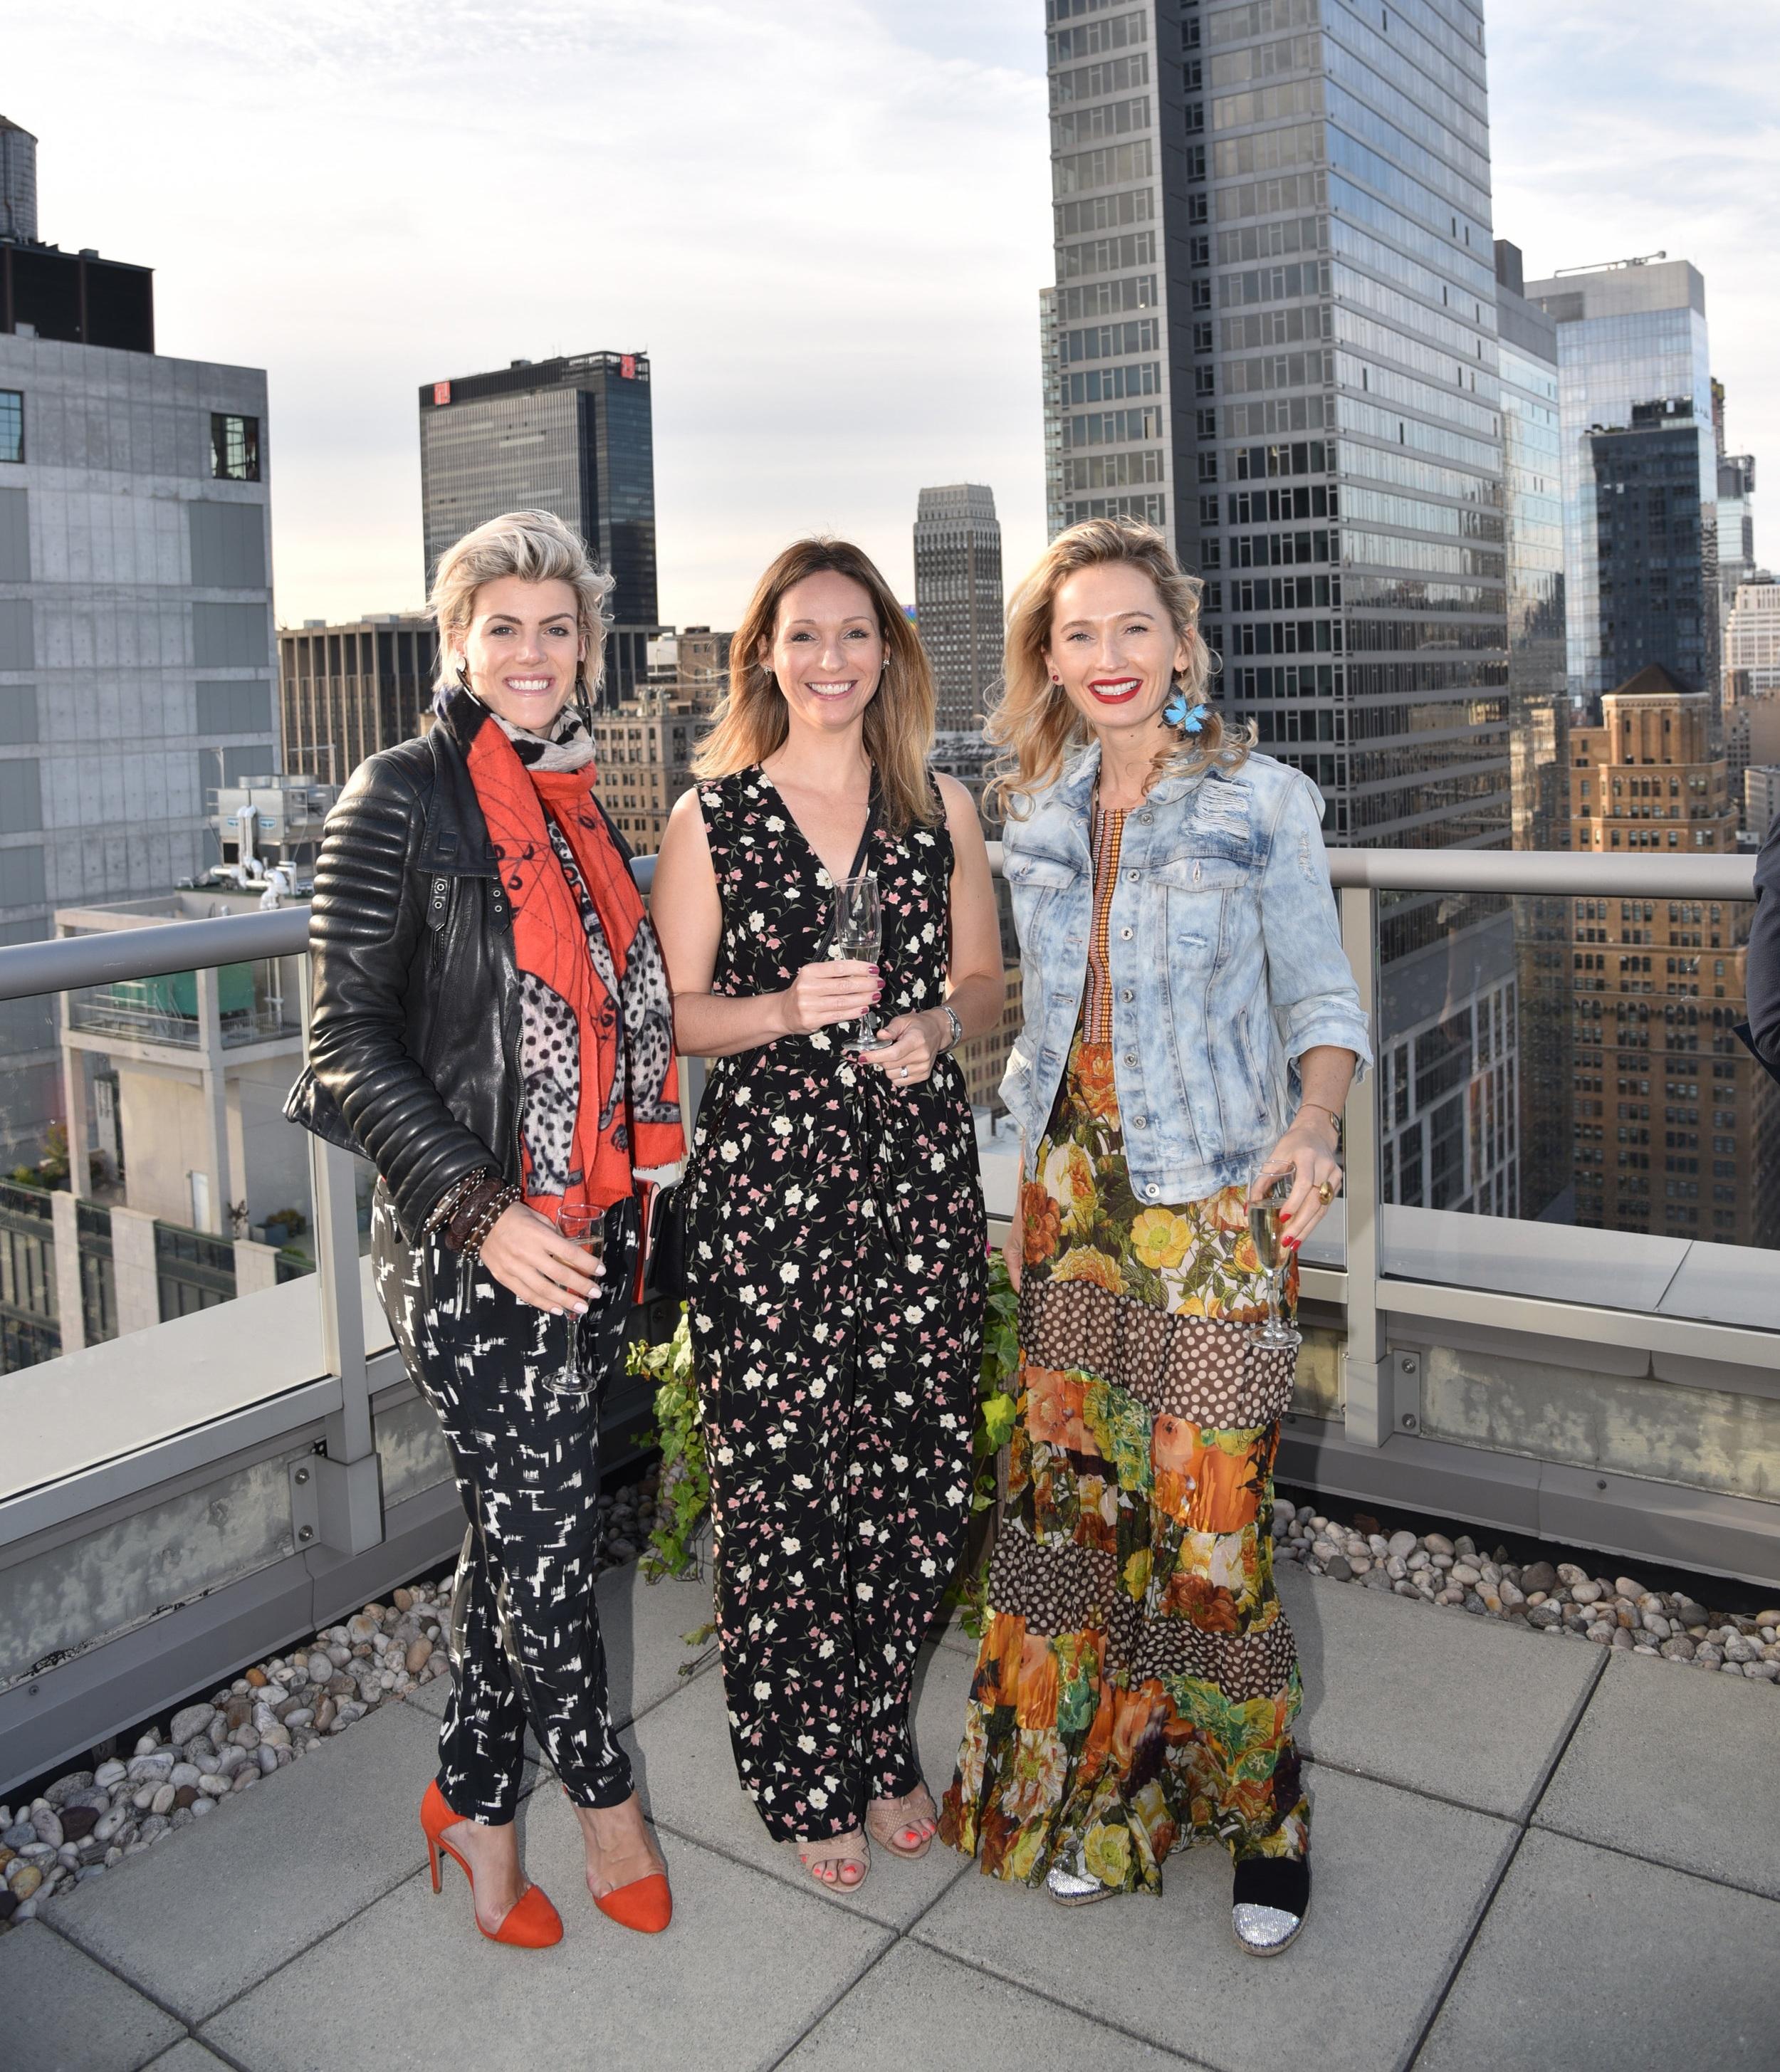 Lorraine de Tymowska, Sarah Parkins, and Nadia Kazakova.